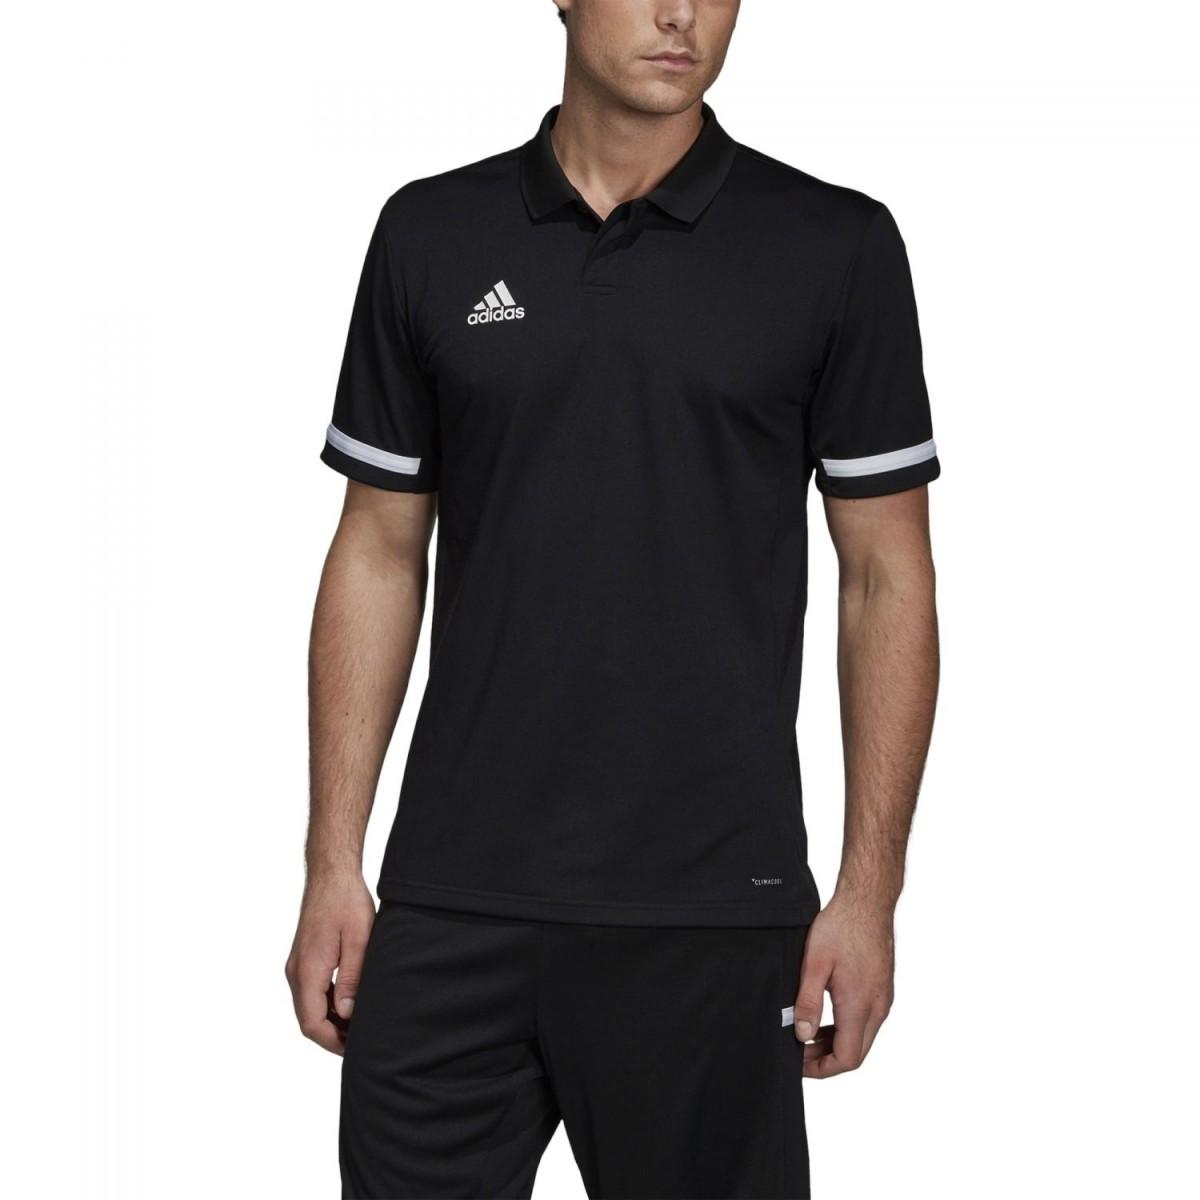 adidas Team 19 Poloshirt